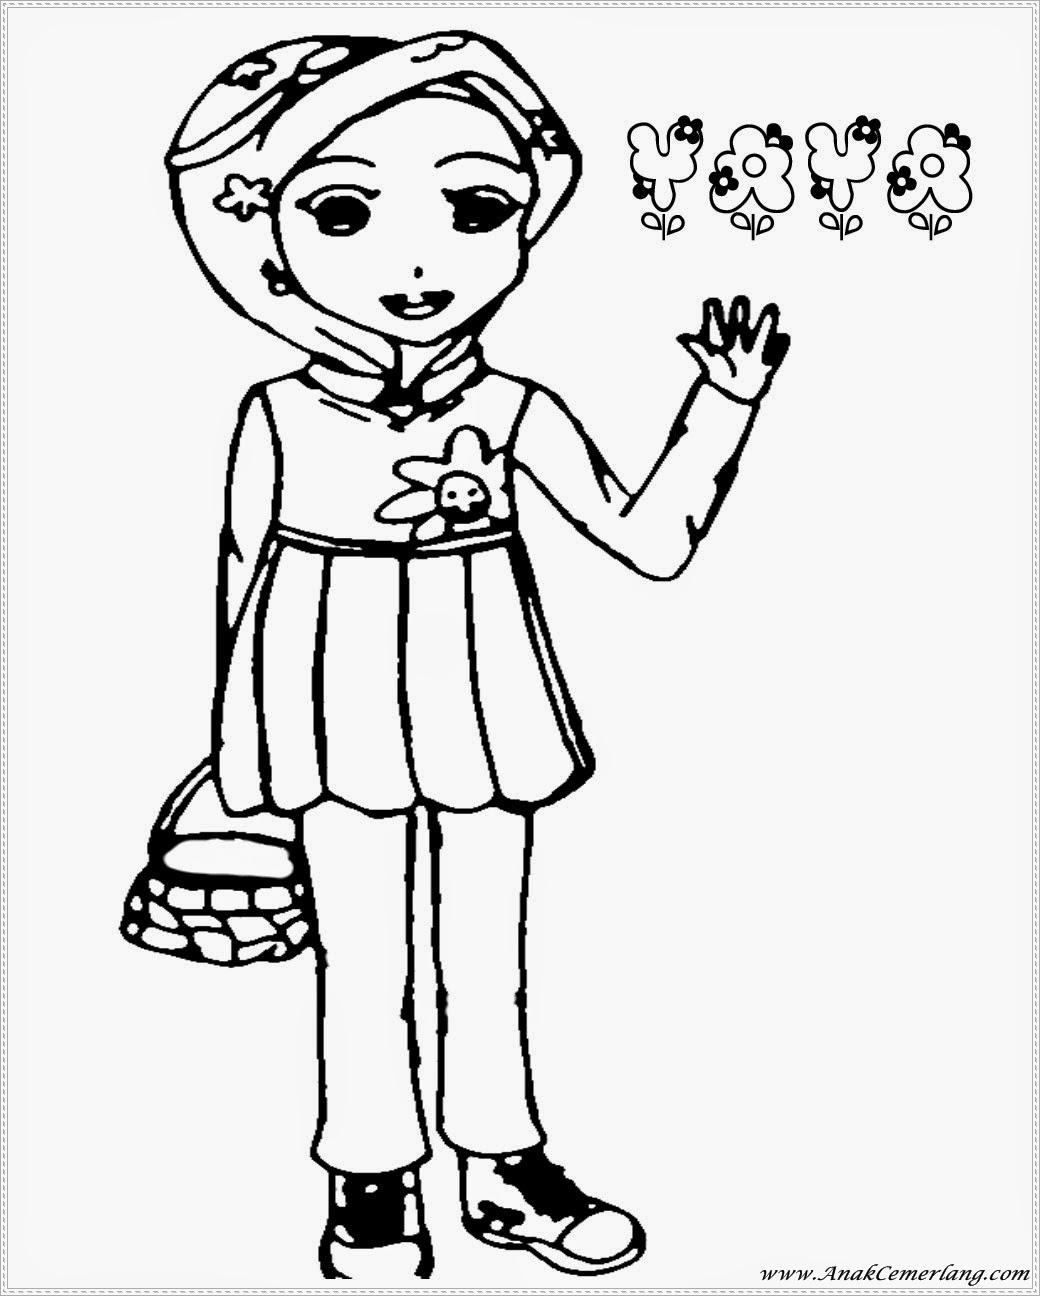 Mewarnai Gambar Boboiboy Bagian 1 Anak Cemerlang